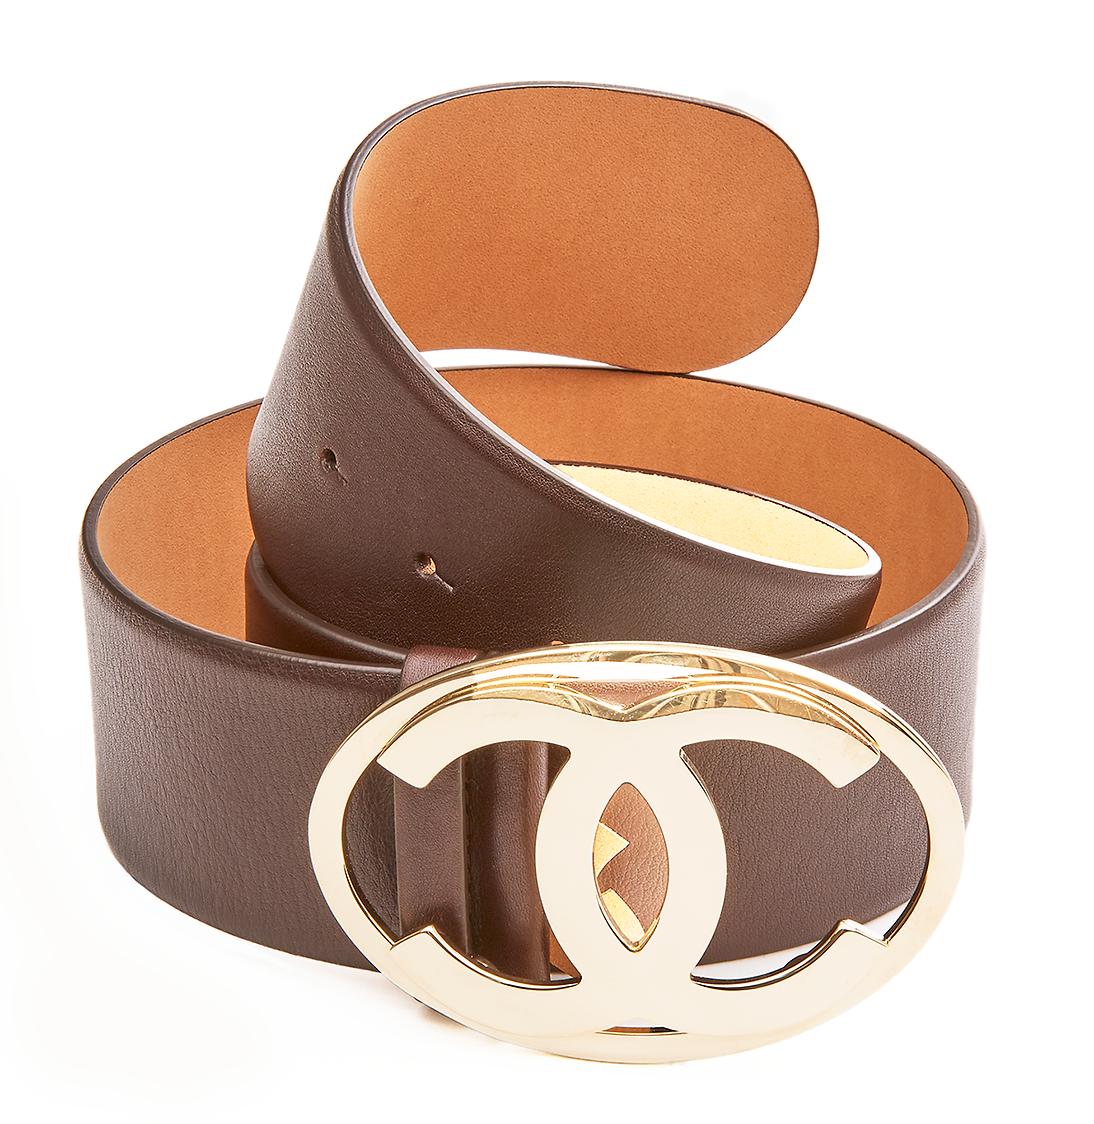 Chanel Belt 2.tif